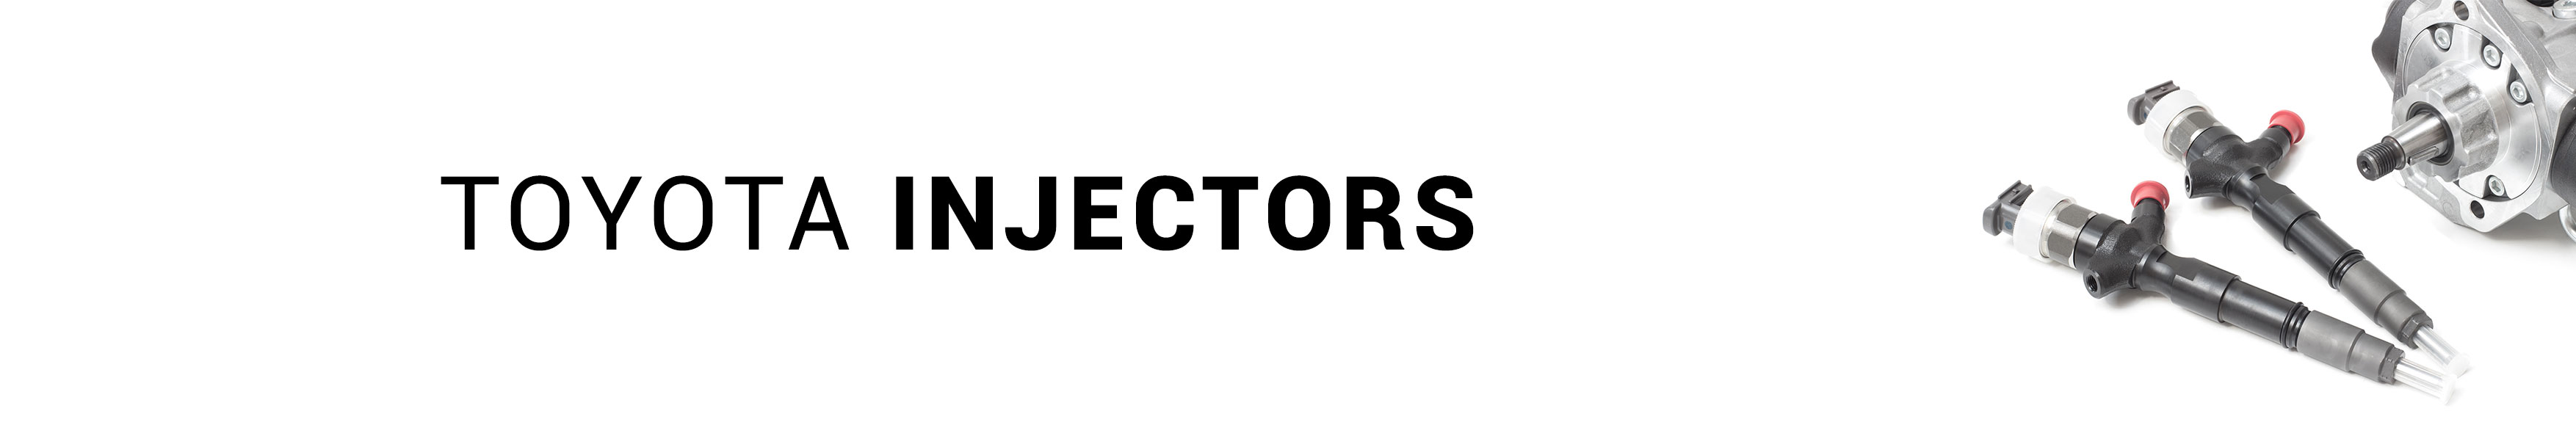 toyota-injectors